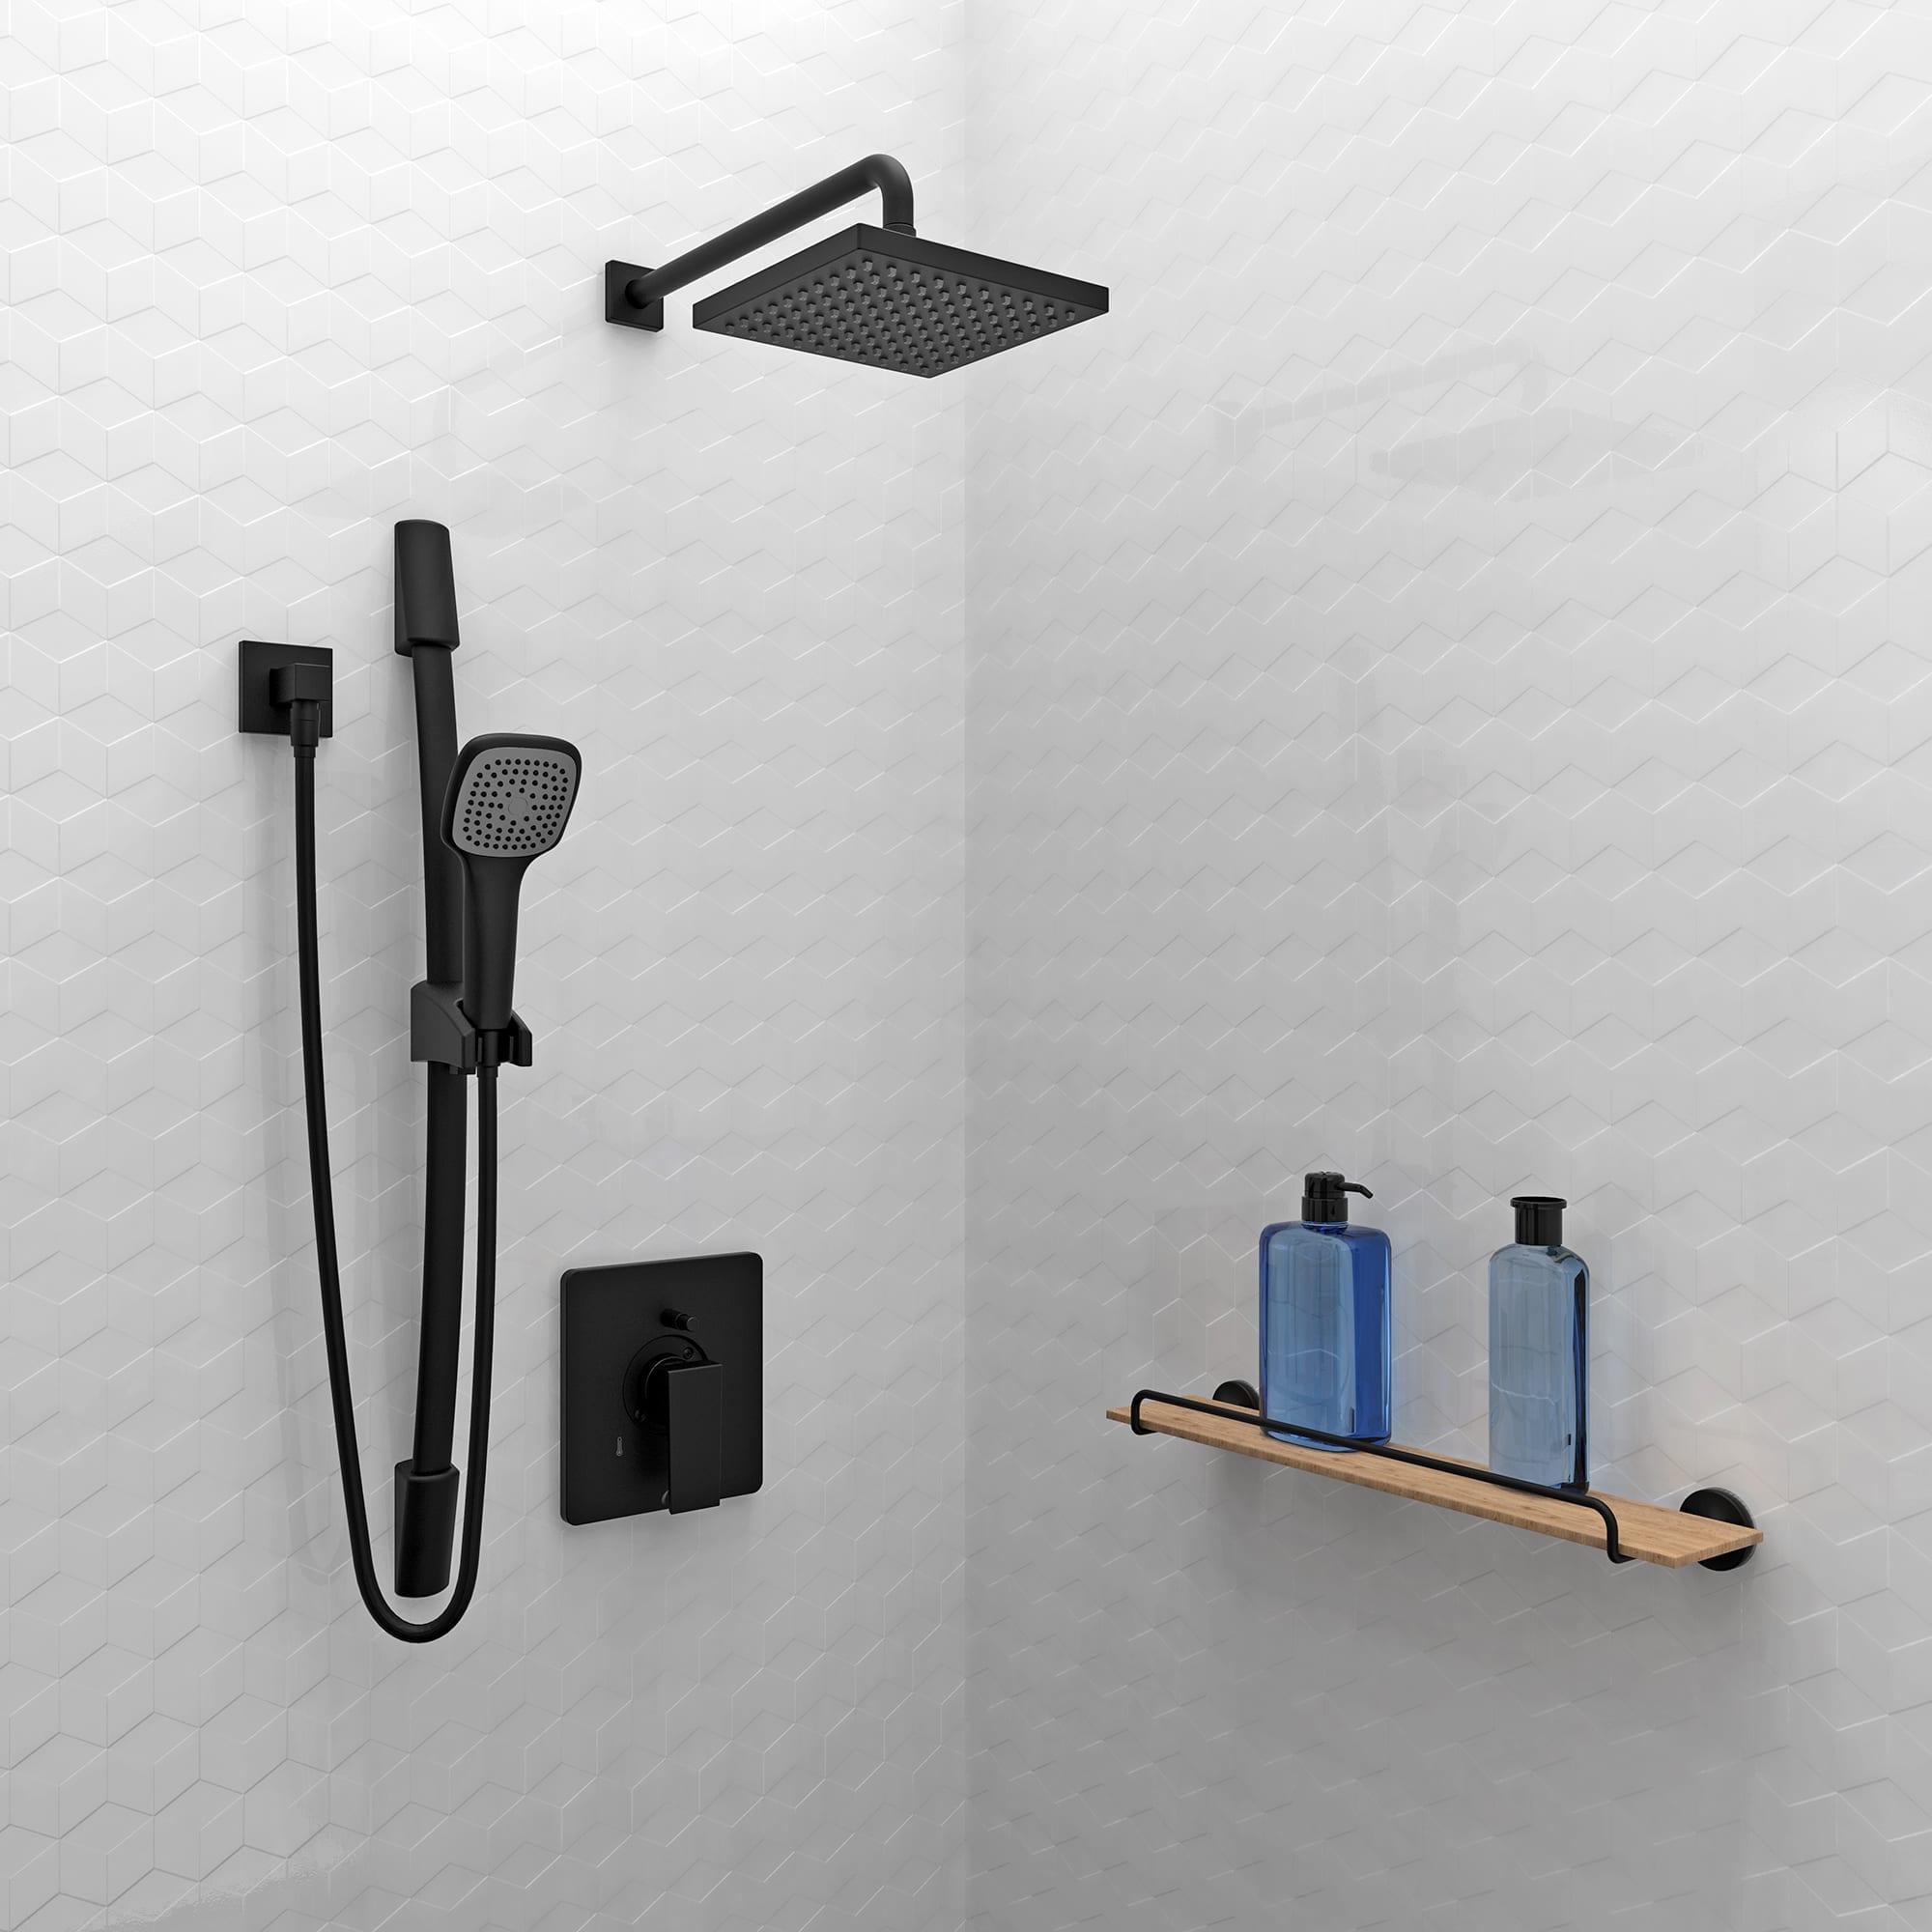 Kit Matte Black Shower Faucet Complete Model With